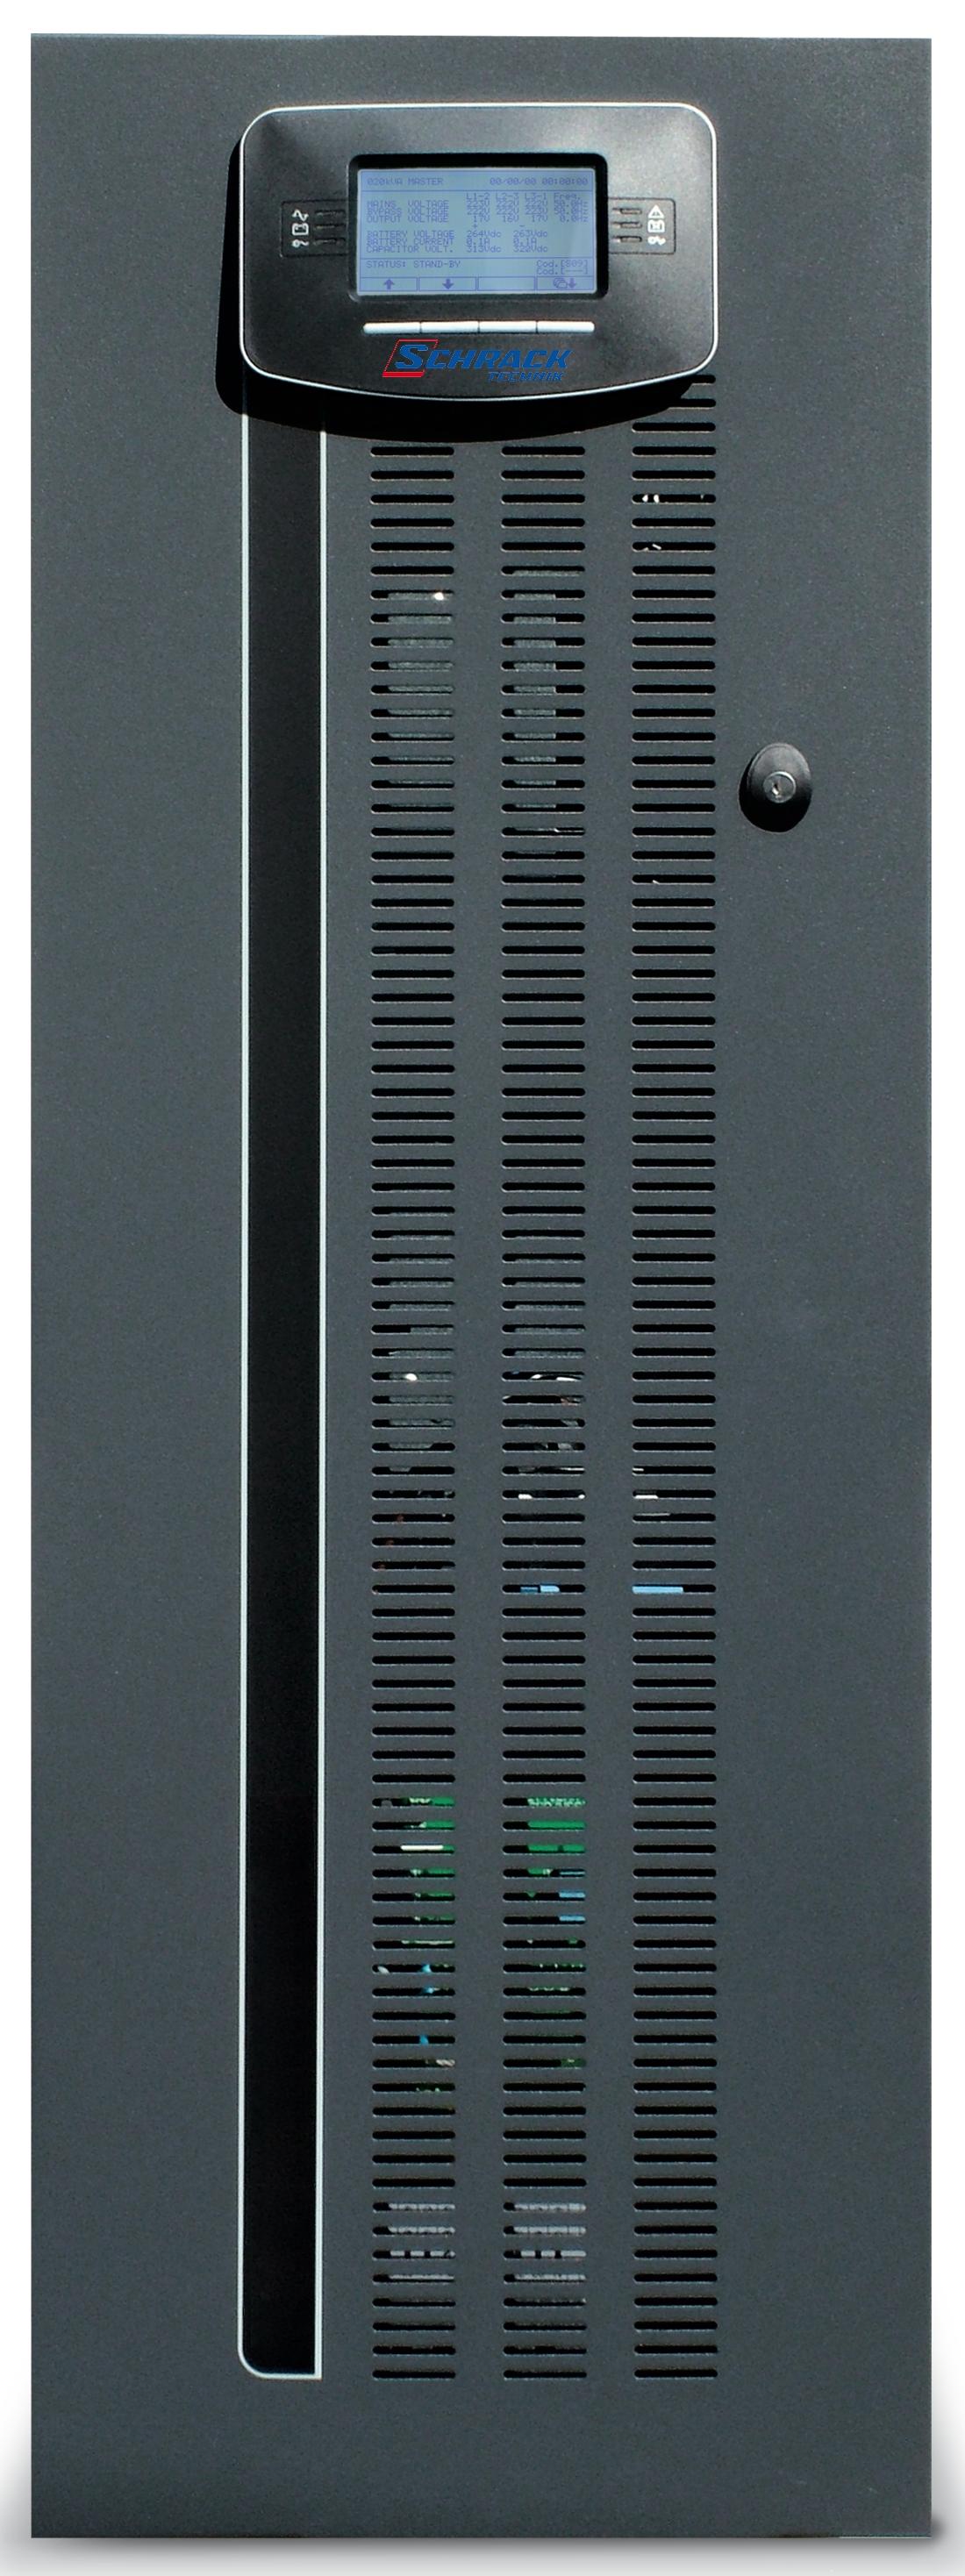 1 Stk USV AVARA Multi 40kVA 36kW 0Min. 3ph/3ph /Online USMLT40XA0